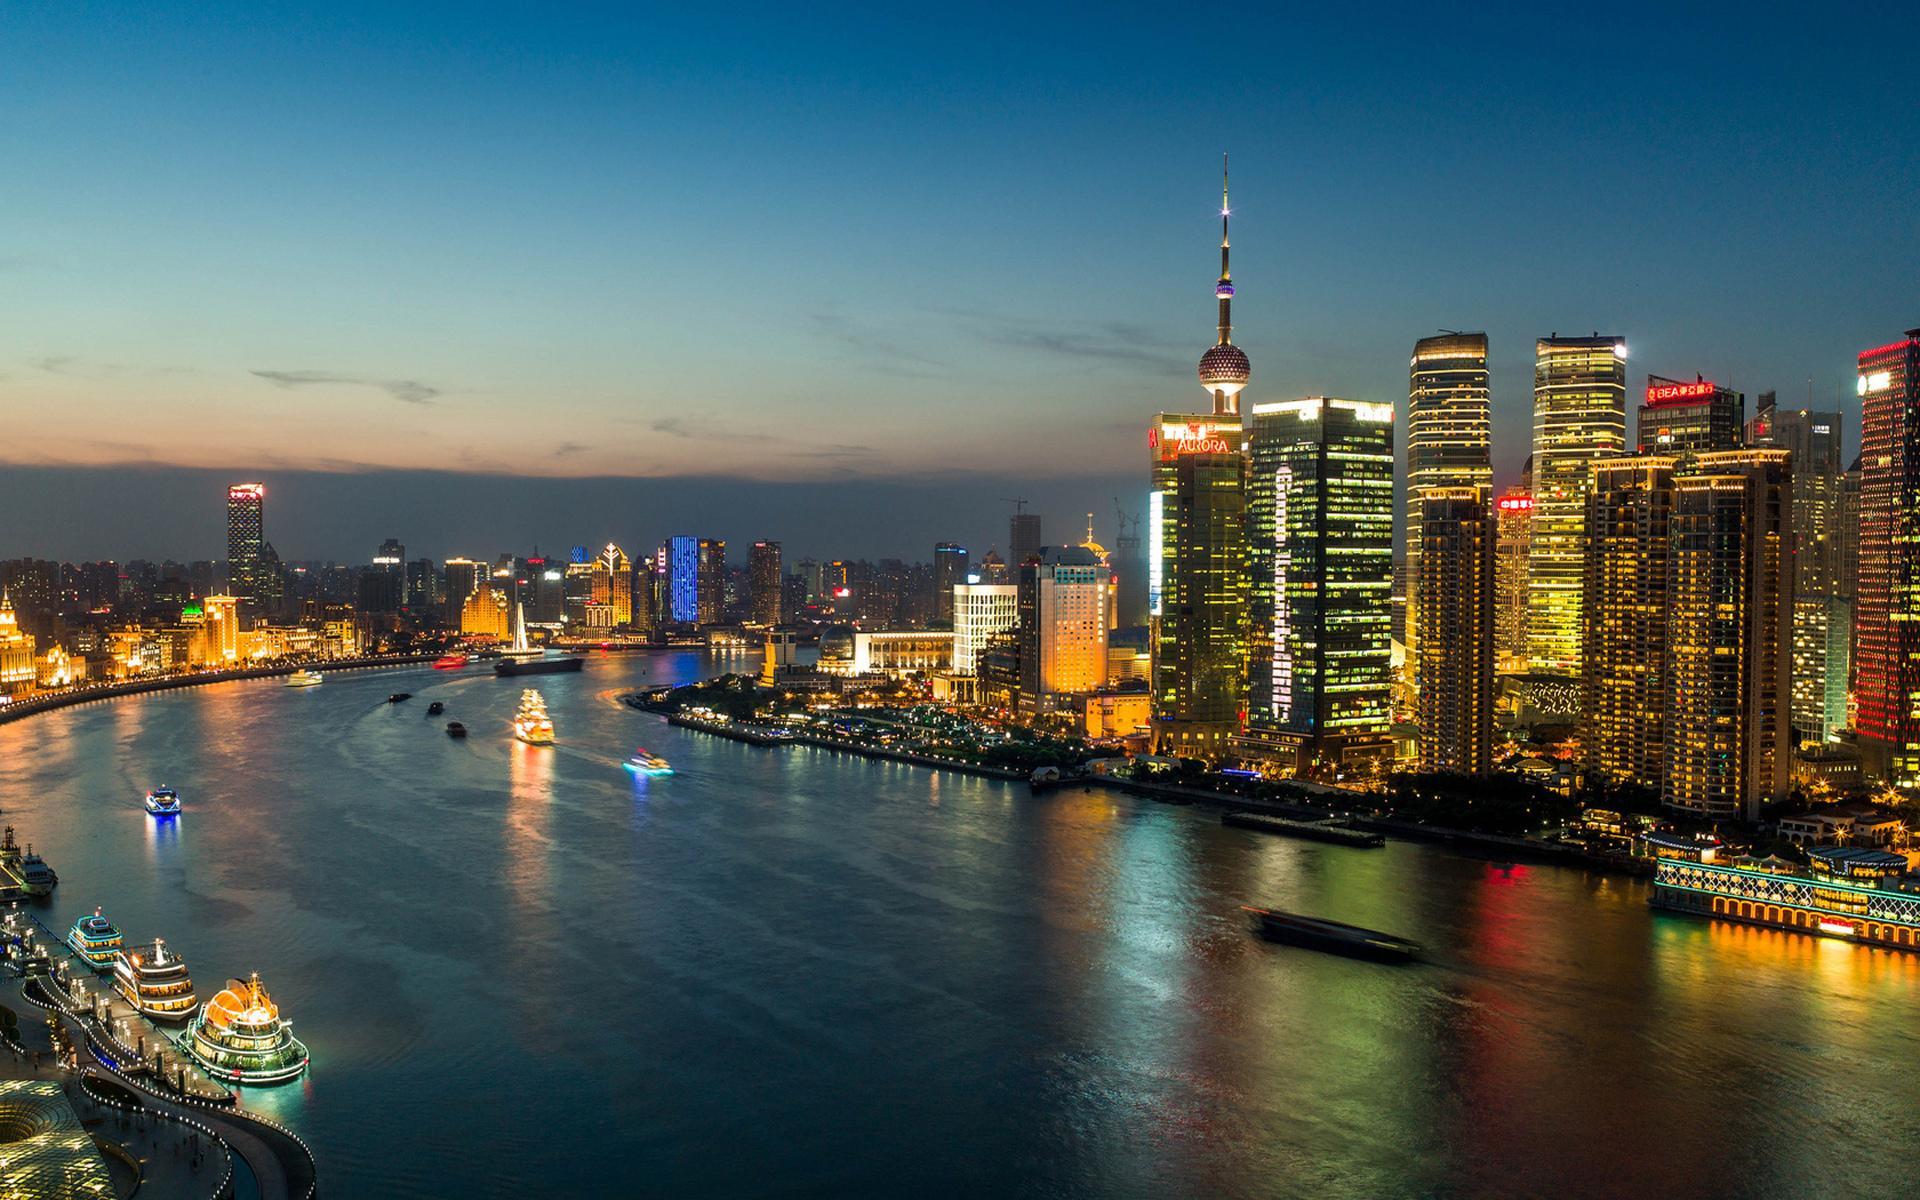 Hd Walpebar: Shanghai Wallpaper HD Download